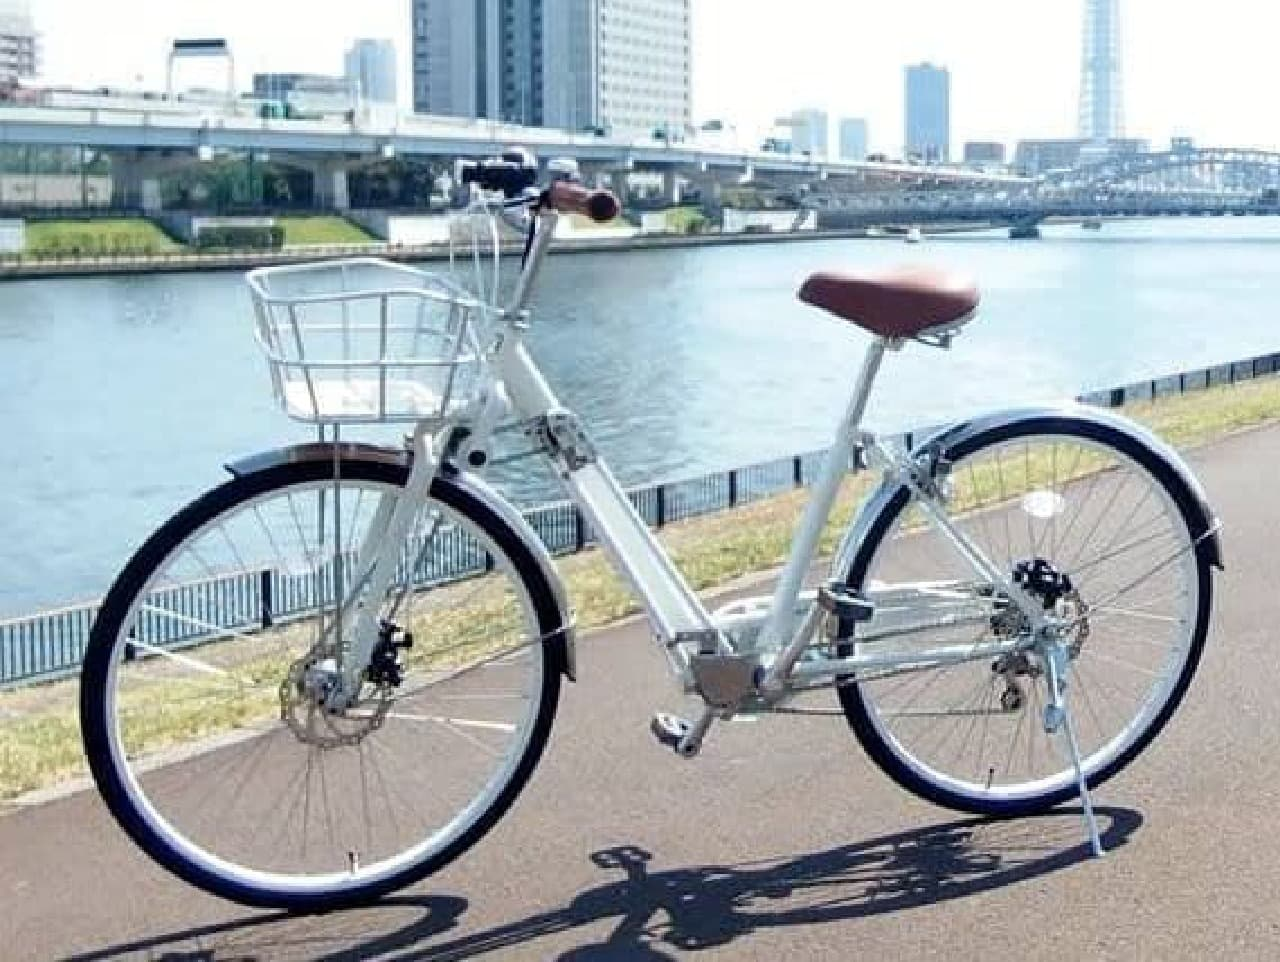 2WD(前後輪駆動)の自転車「DOUBLE(ダブル)」に、ママチャリバージョン「